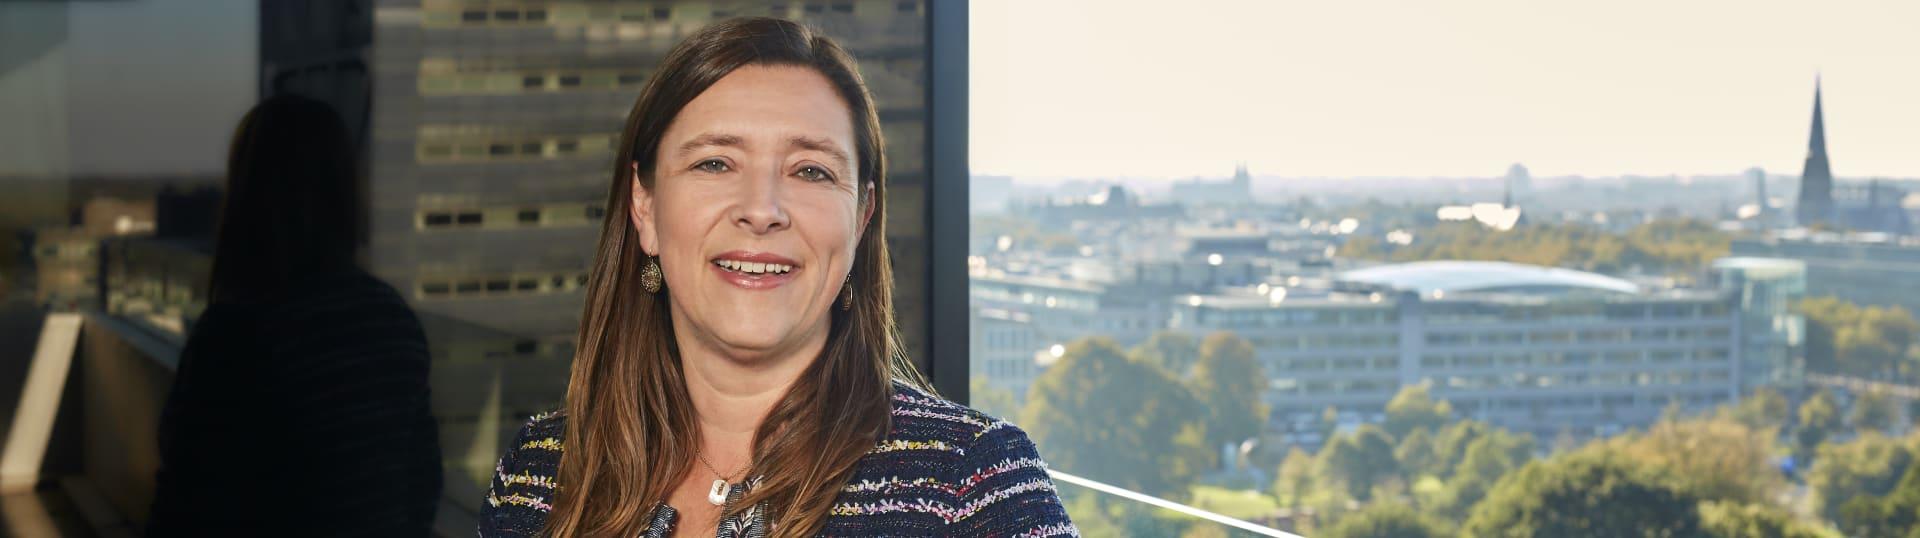 Marie-Jeanne Zillikens-Loos, kandidaat-notaris Pels Rijcken